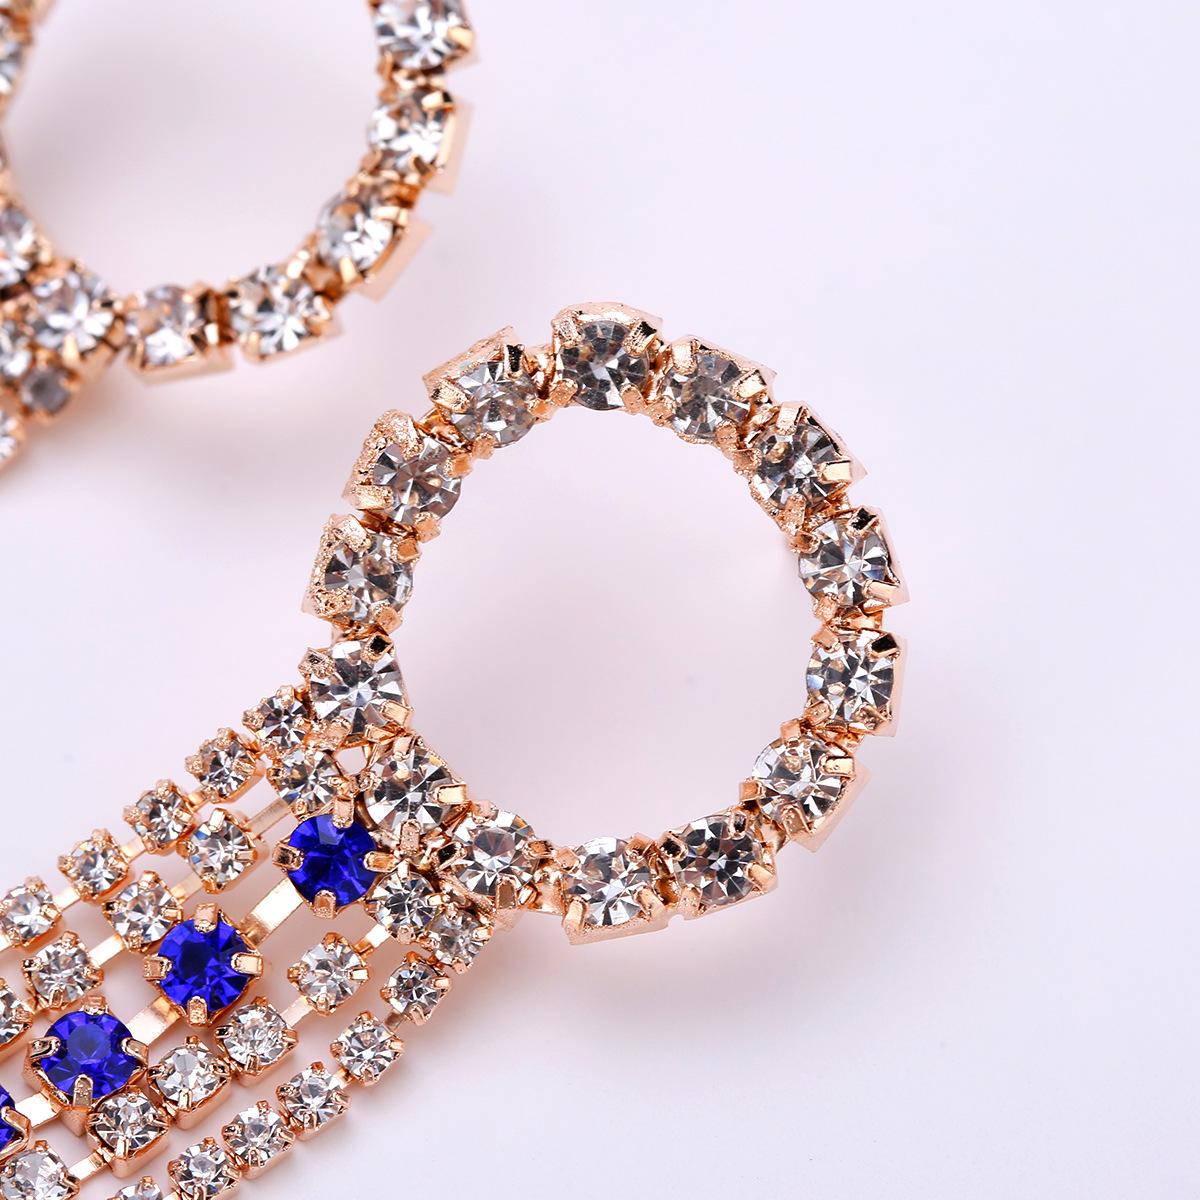 Alloy Fashion Geometric earring  (Alloy Blue) NHJE1483-Alloy-Blue